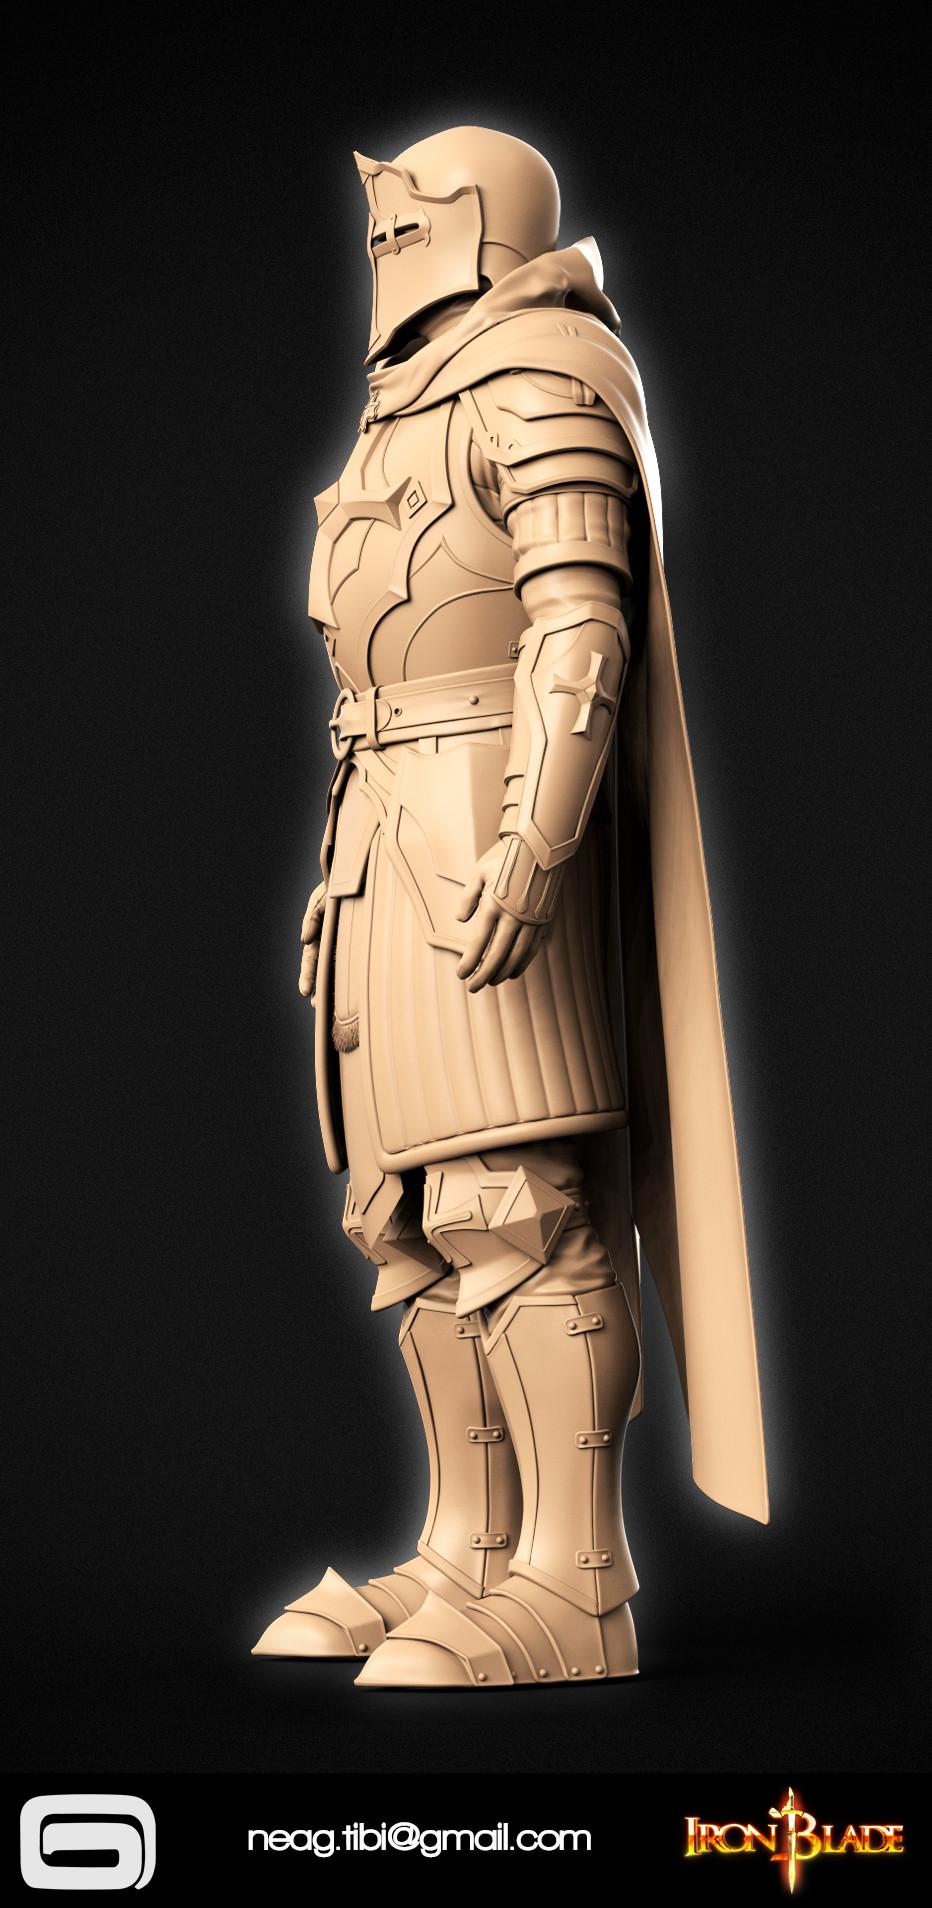 Tibi neag tibi neag iron blade templara high 04